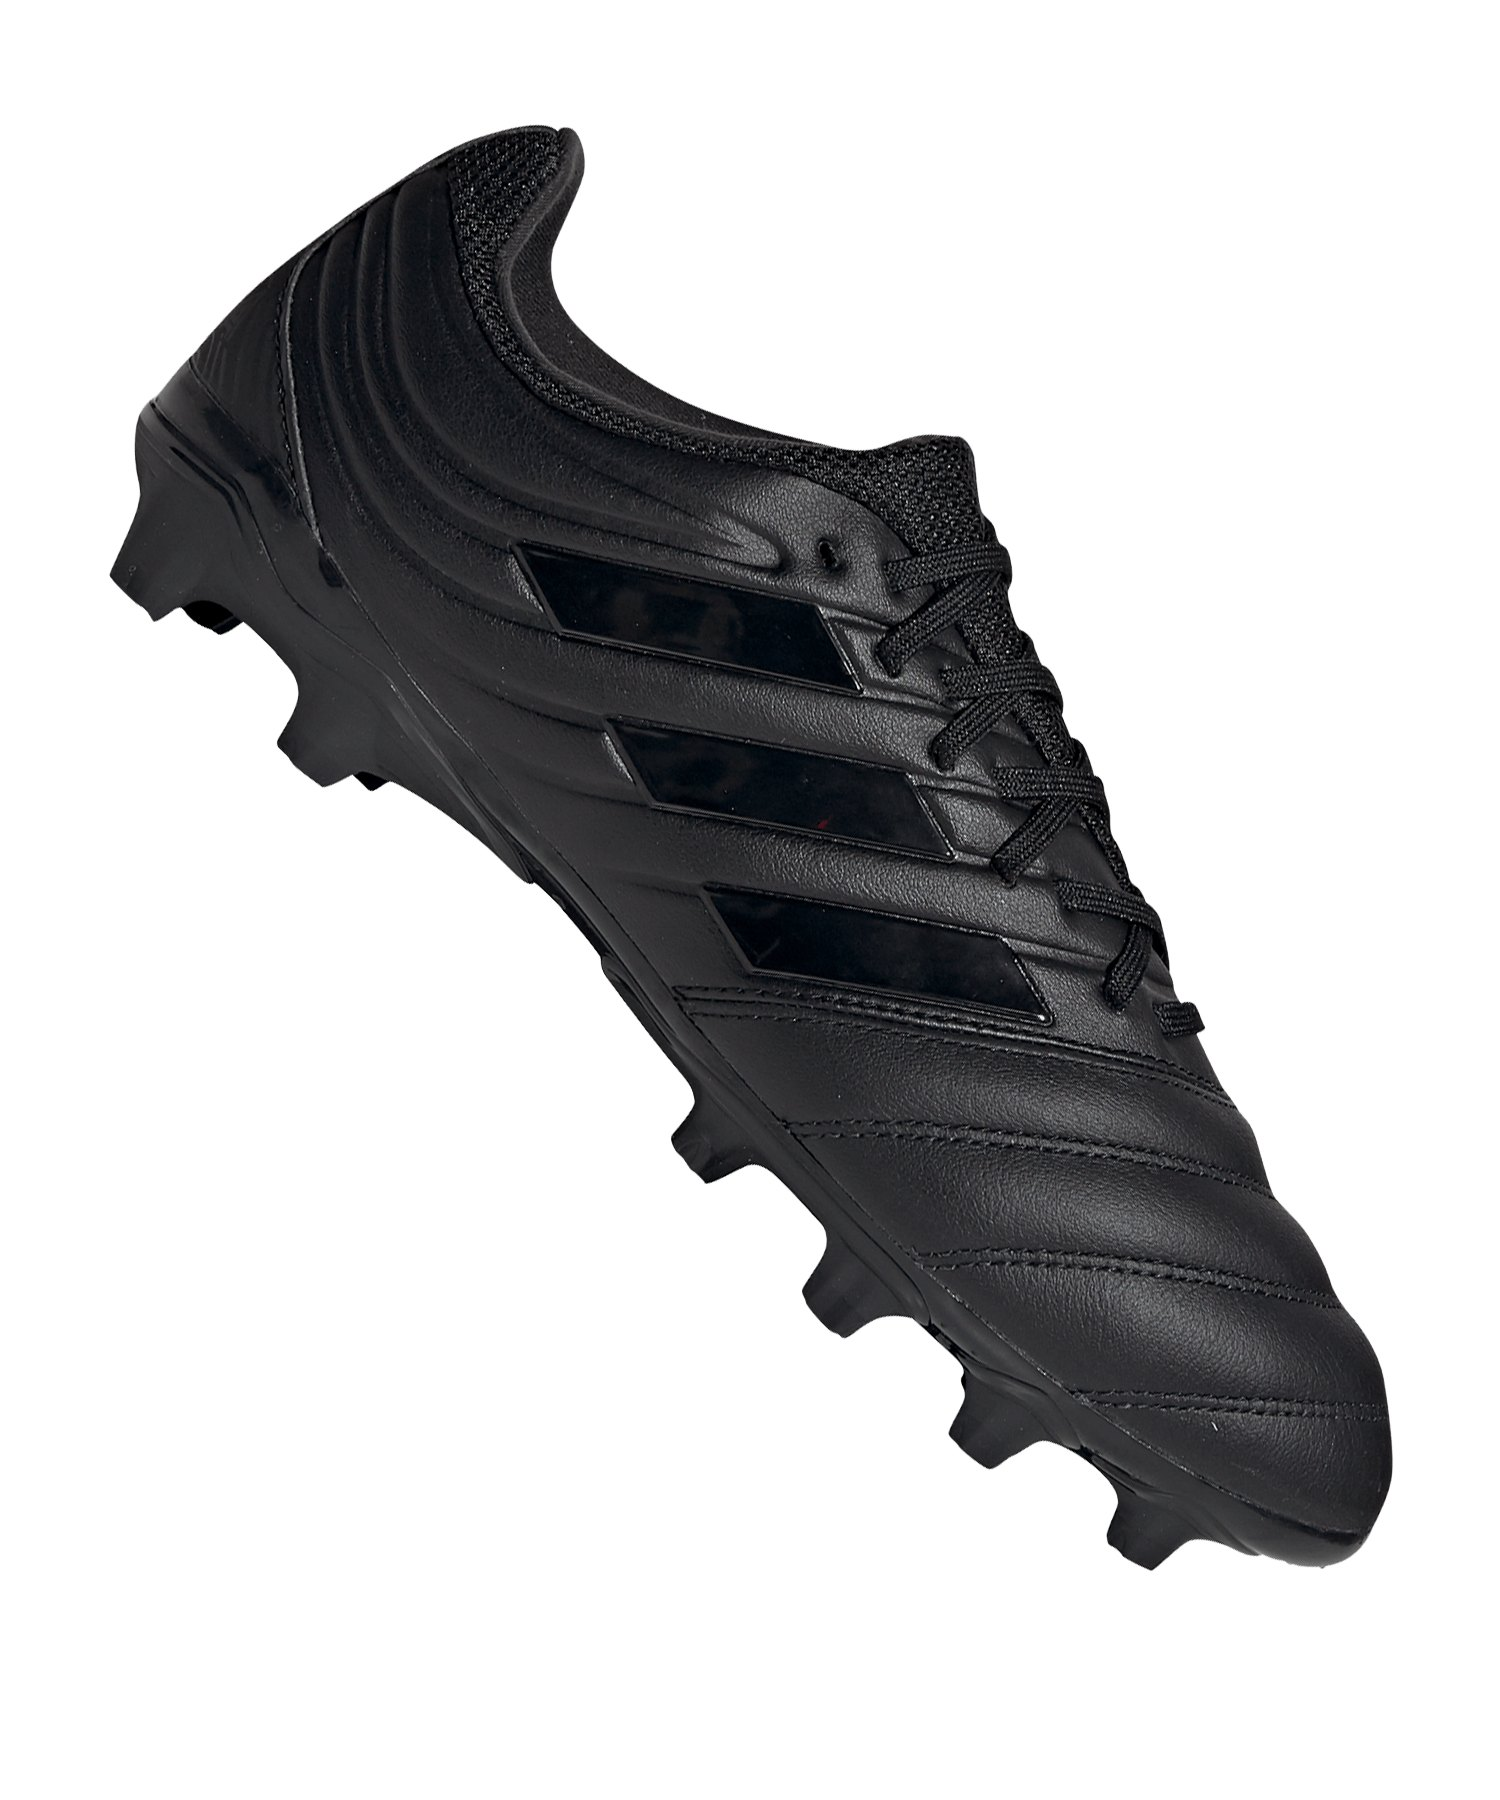 adidas COPA 20.3 MG Schwarz Grau - schwarz